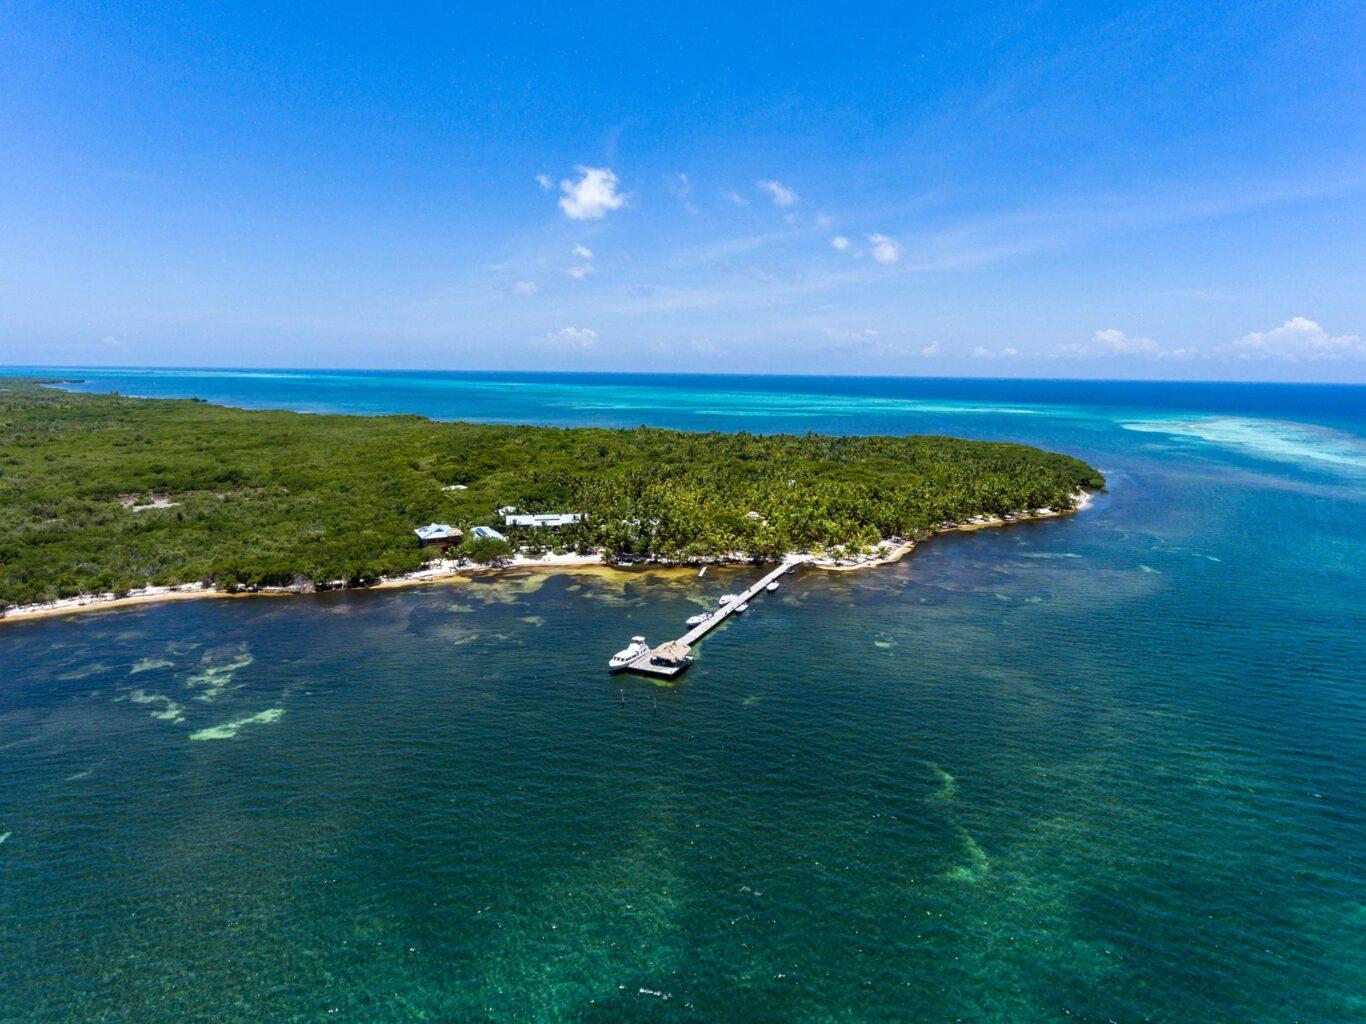 lighthouse reef belize diving